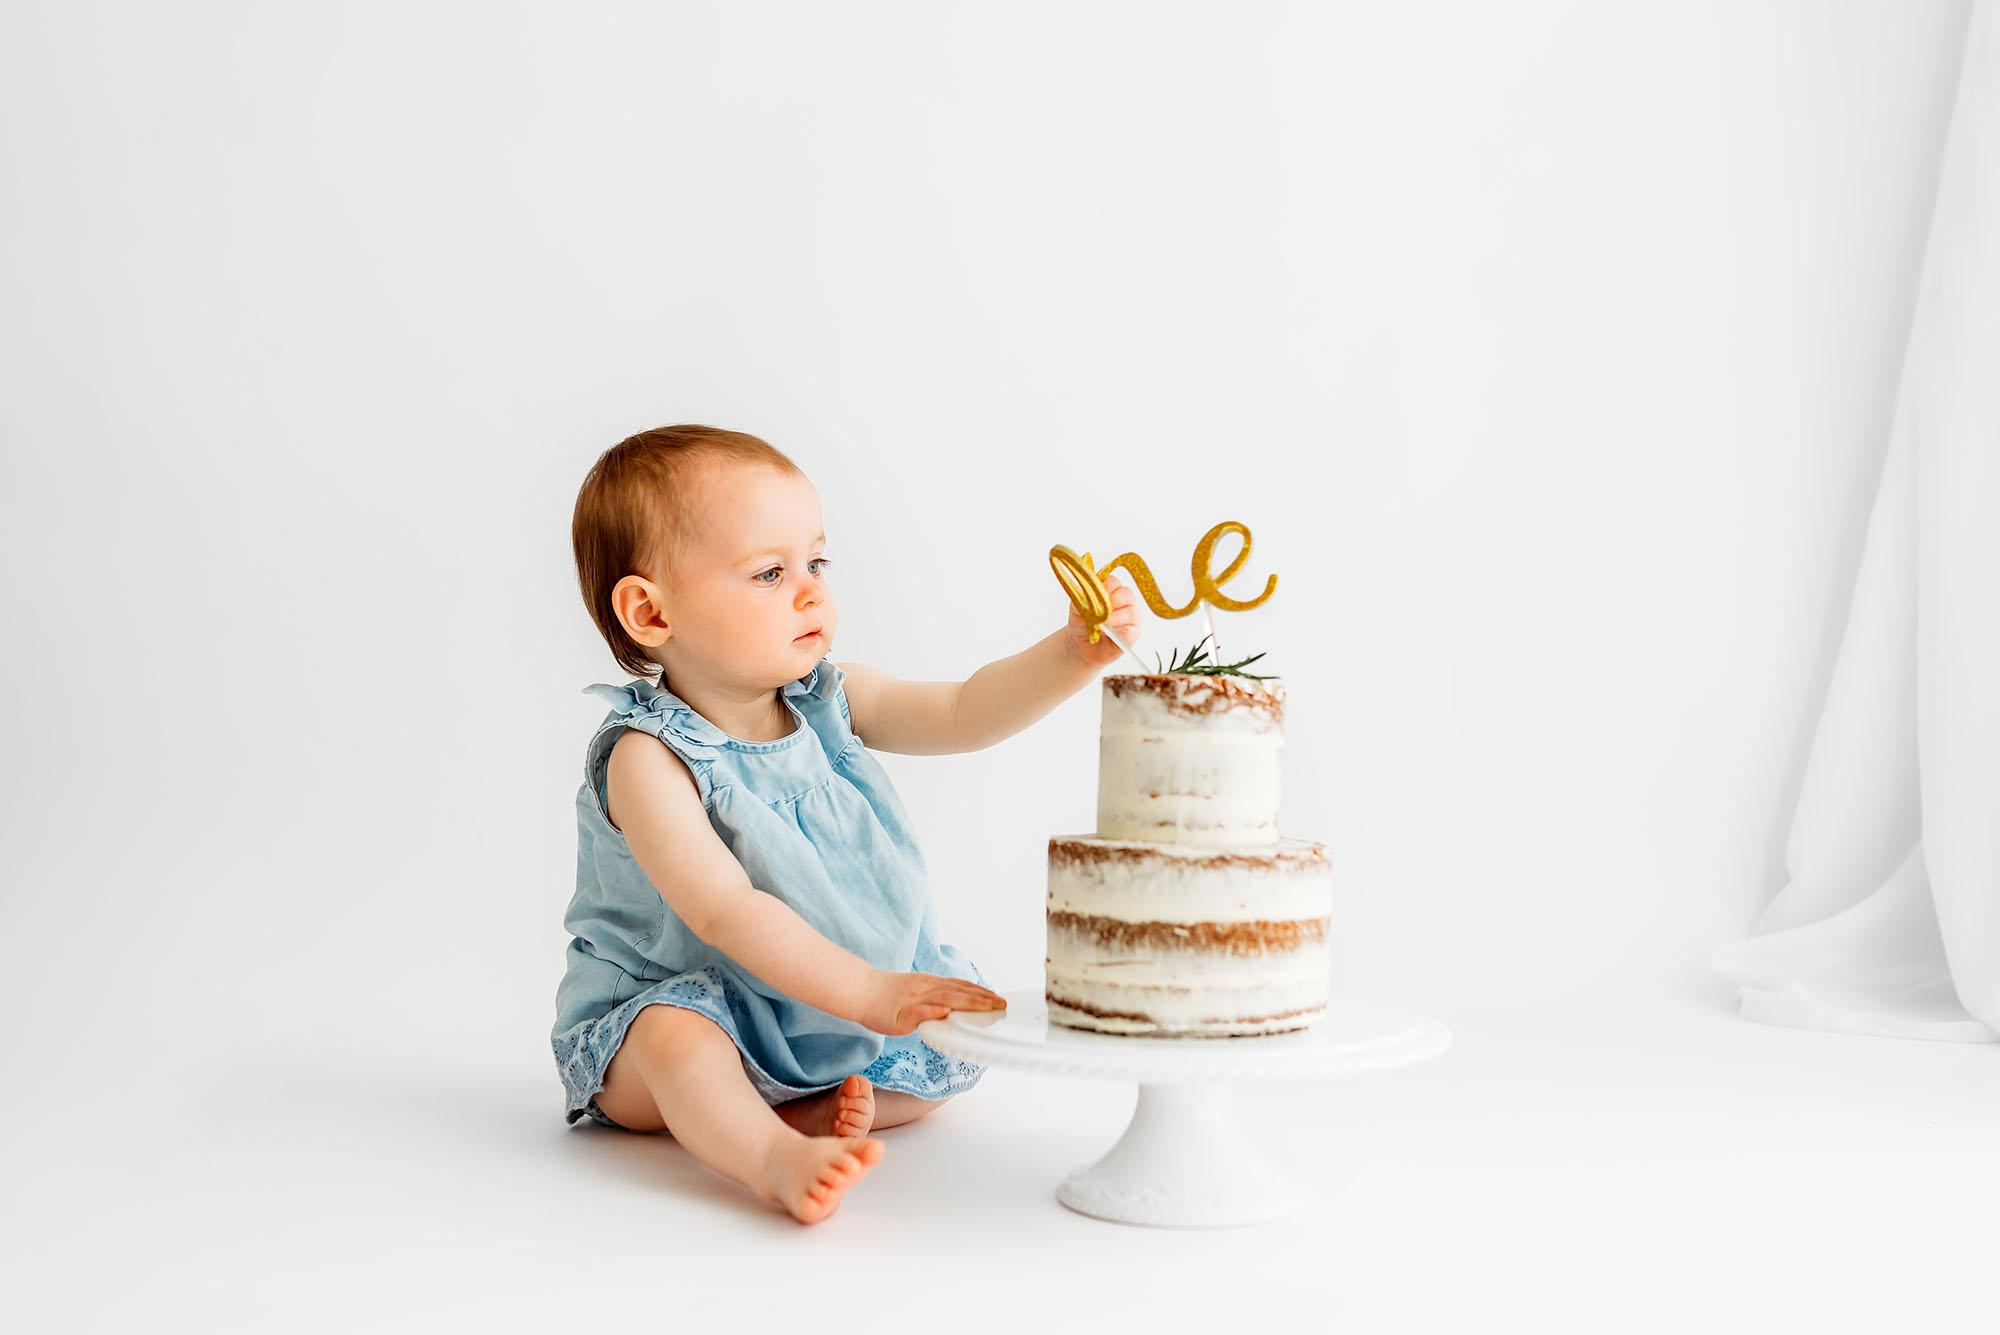 Barnsley photographer at a cake smash photoshoot